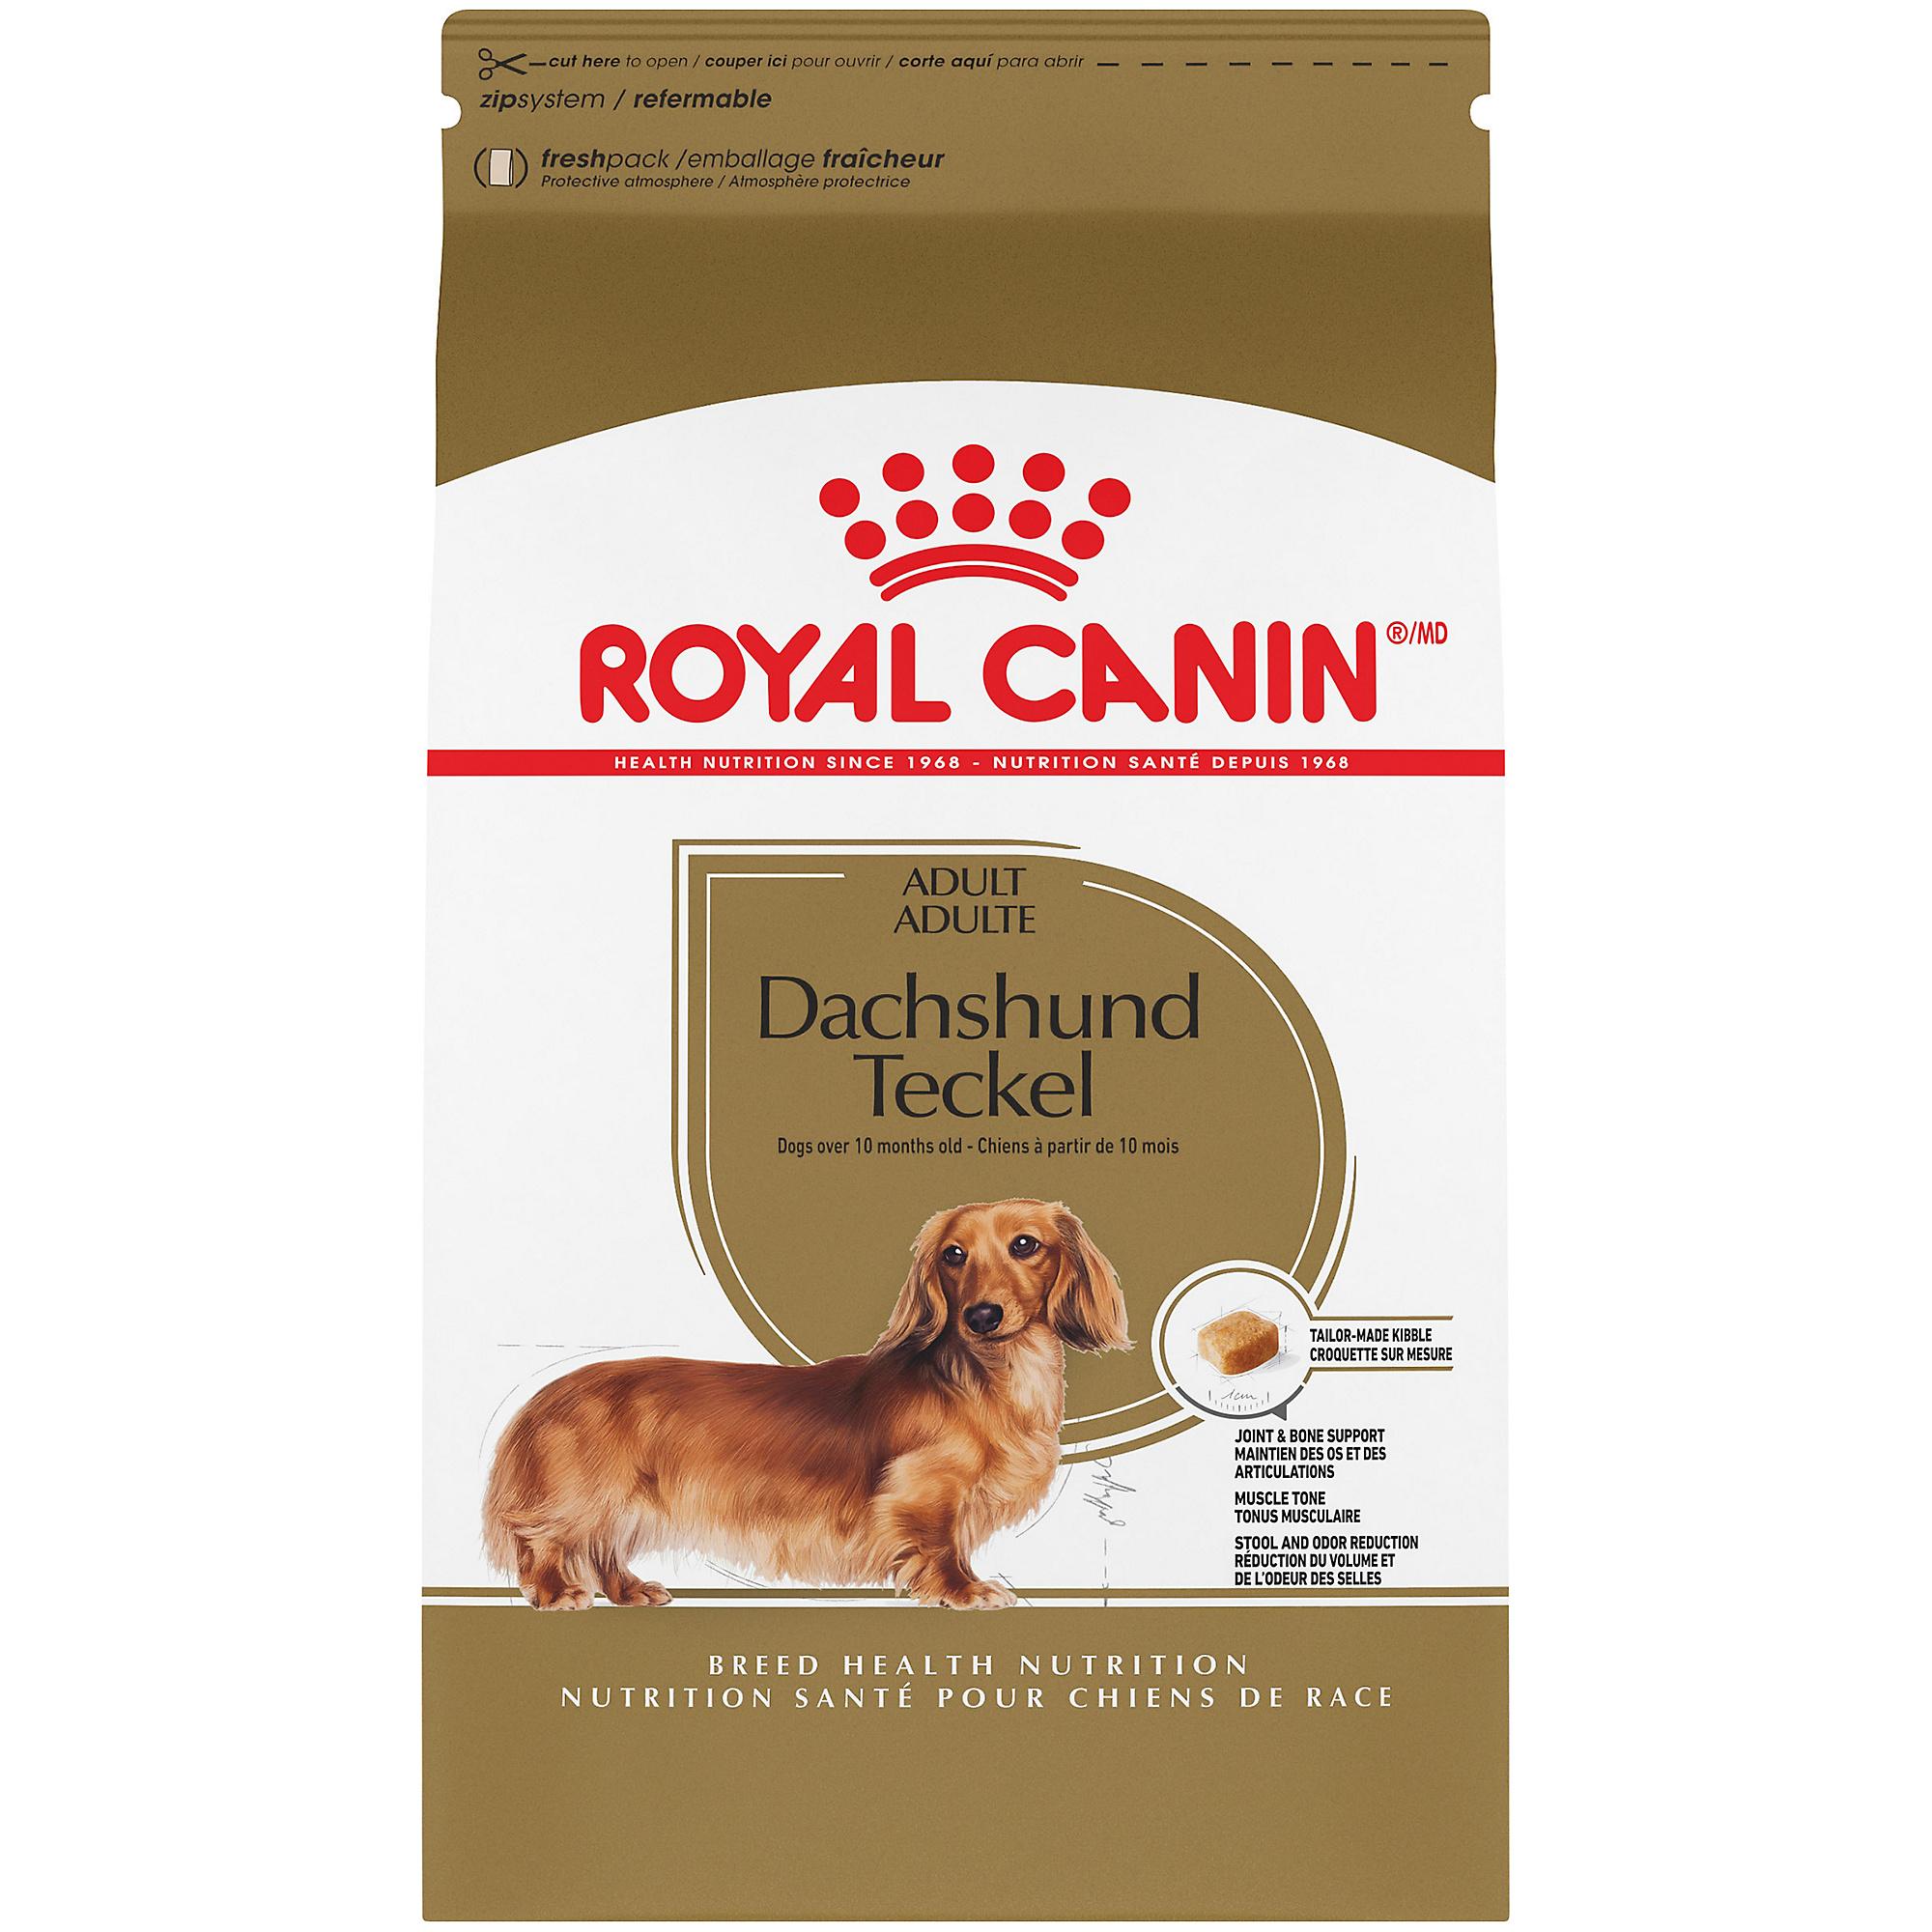 Royal Canin Breed Health Nutrition Dachshund Adult Dry Dog Food Image